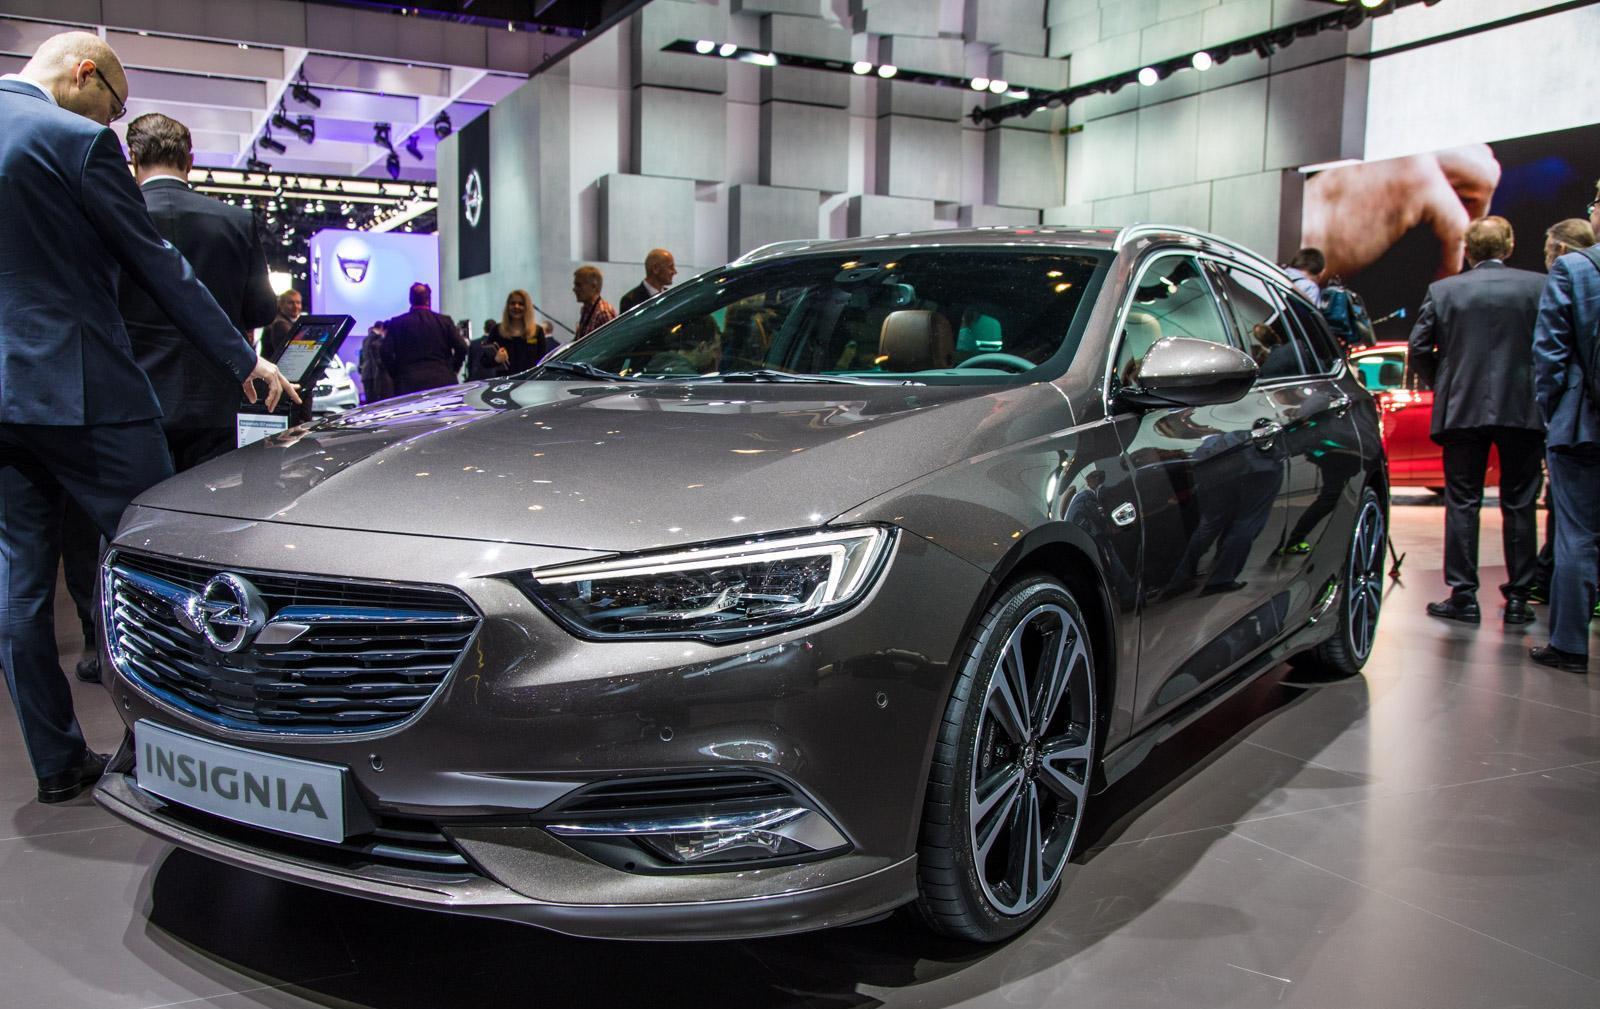 Opel-insignia-002